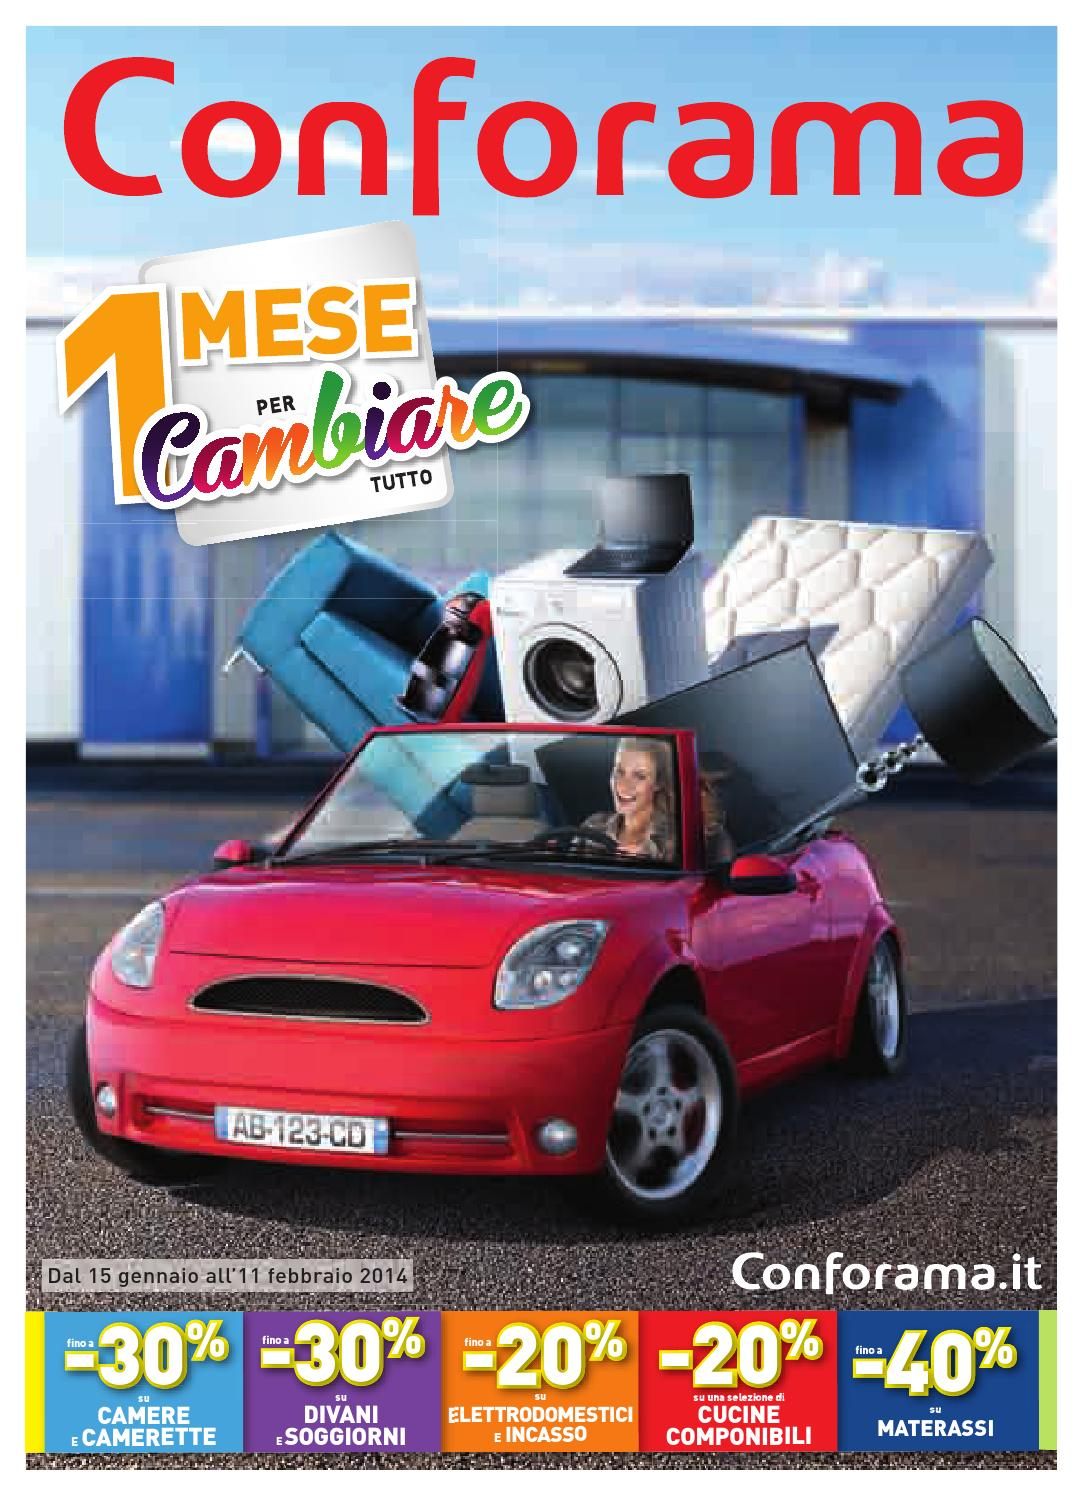 Conforama volantino 15gennaio 11febbraio2014 by ...